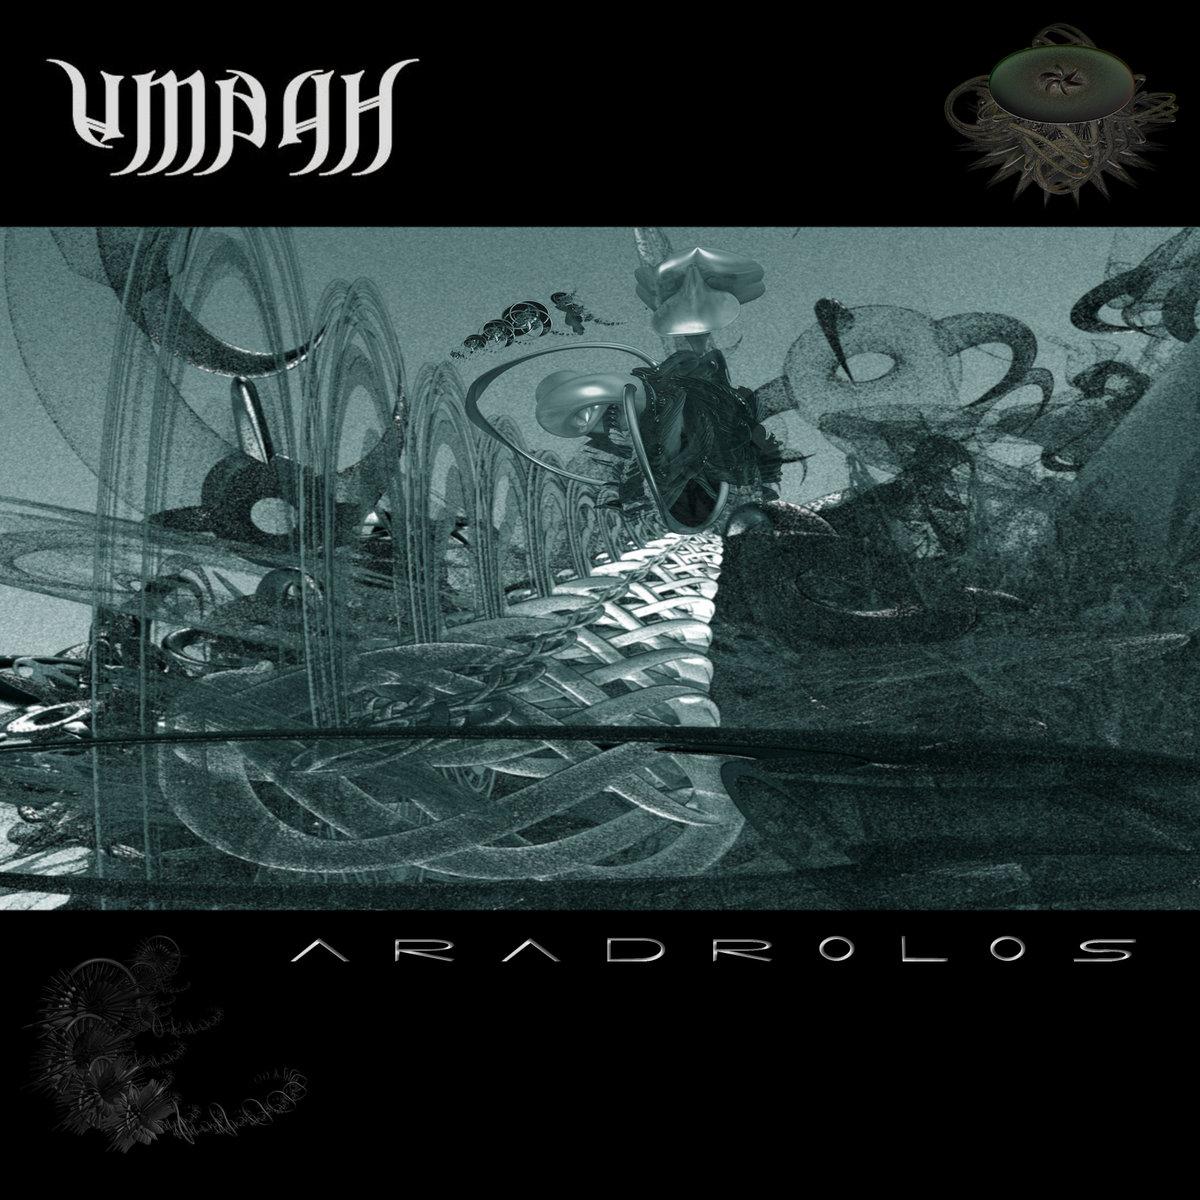 UMBAH - Aradrolos cover